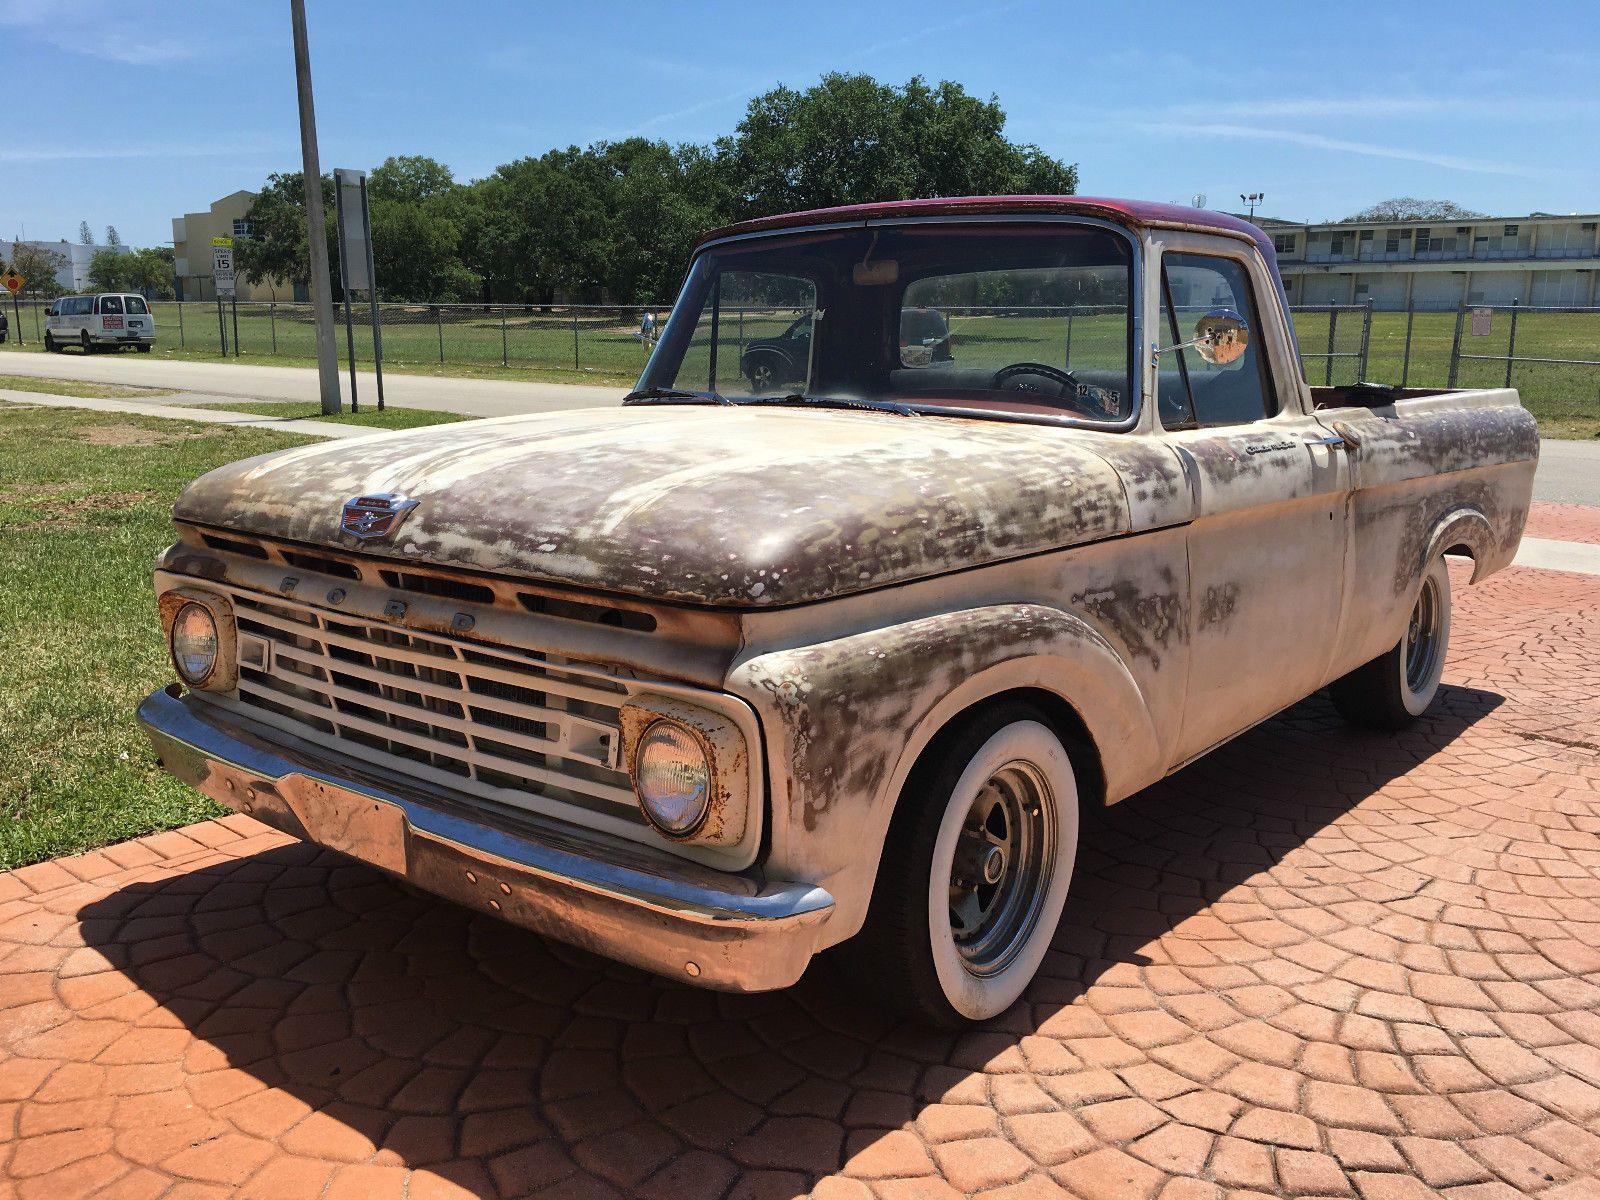 1963 Ford F 100 Unibody Patina Truck | Custom trucks for sale ...